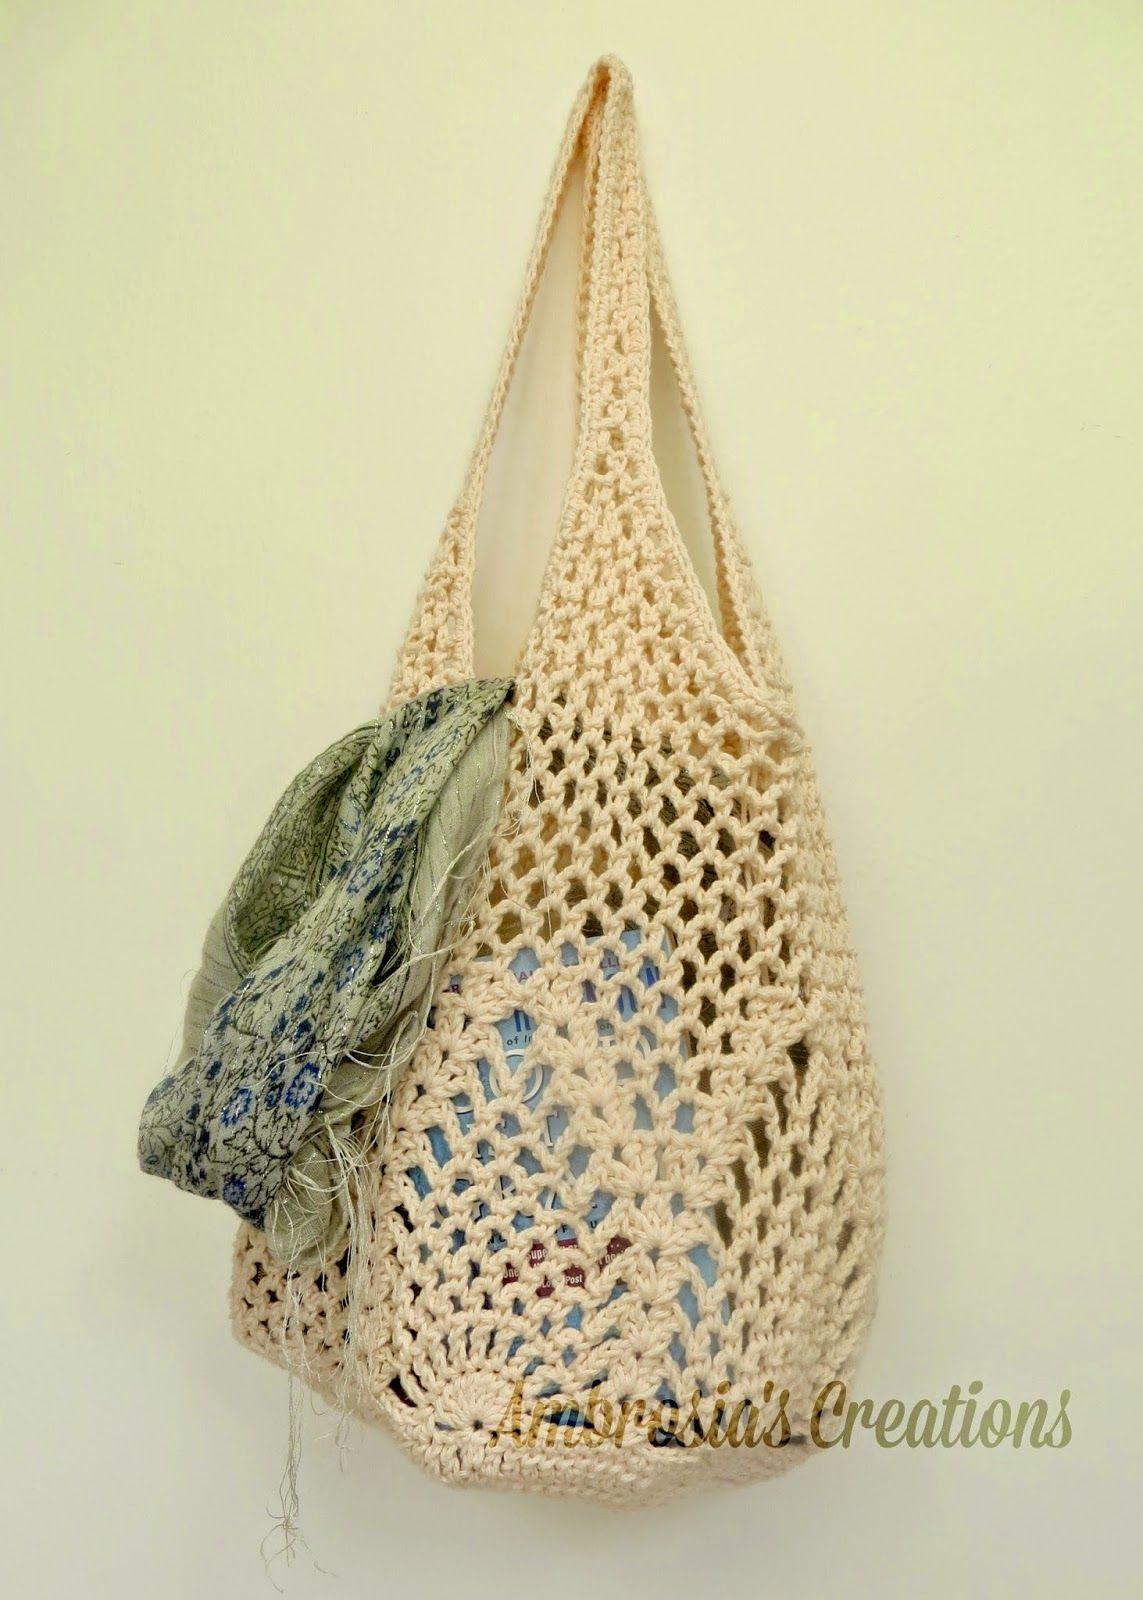 Ambrosias Creations Pattern Pineapple Crochet Market Bag Chart